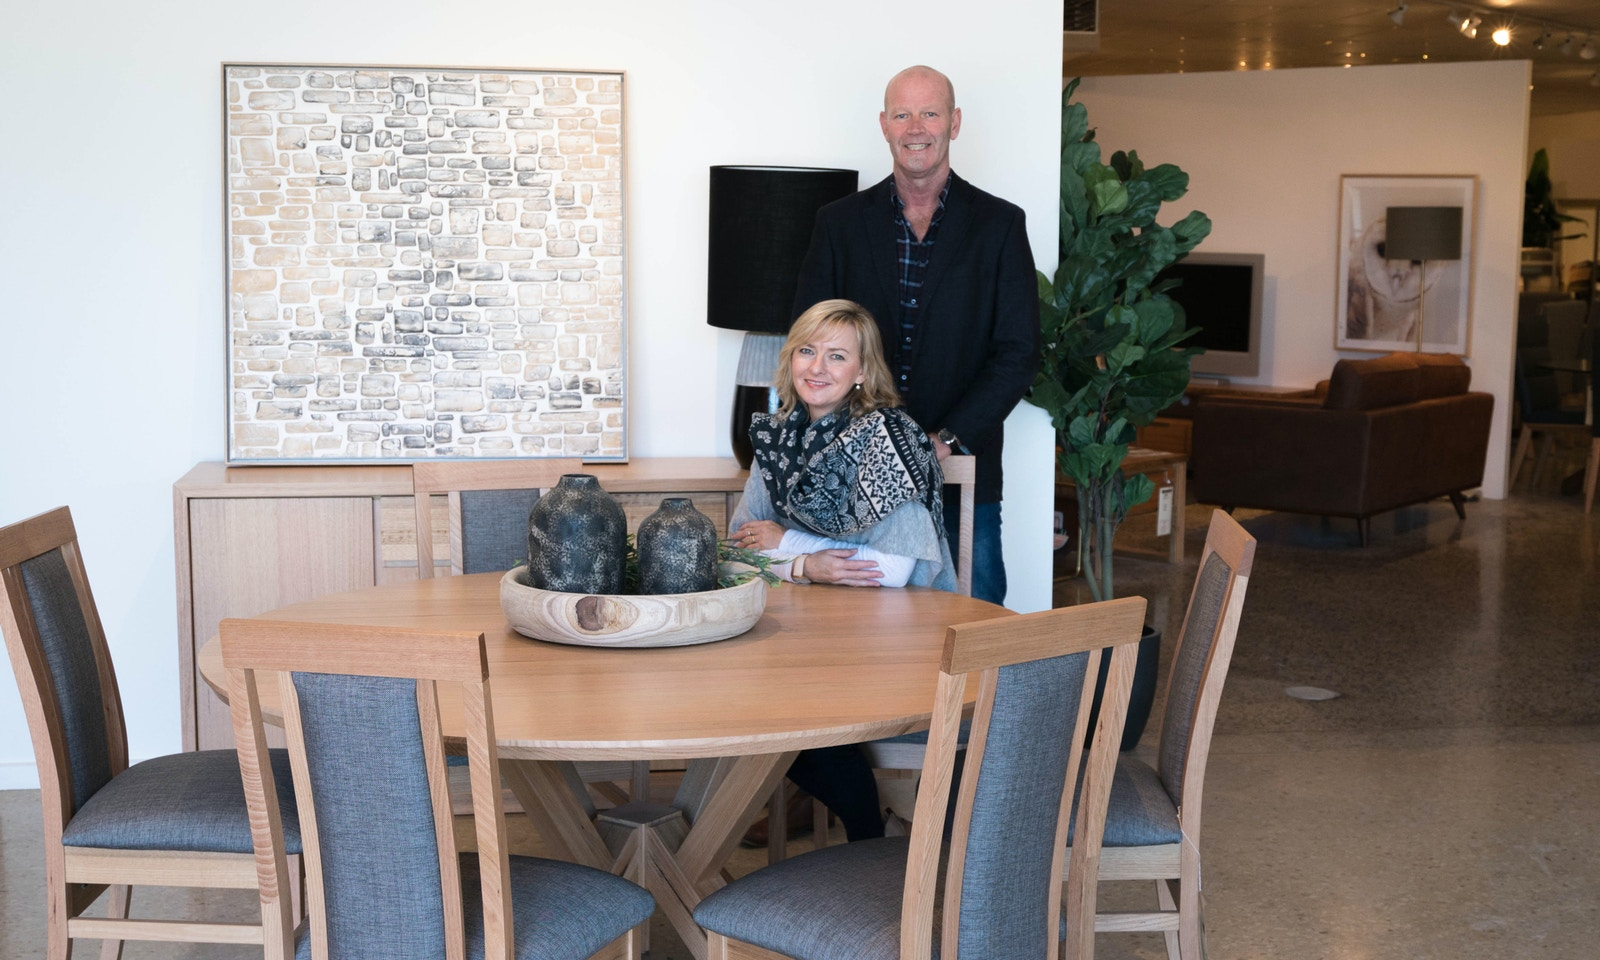 Meet the new Classic – Kimberly James